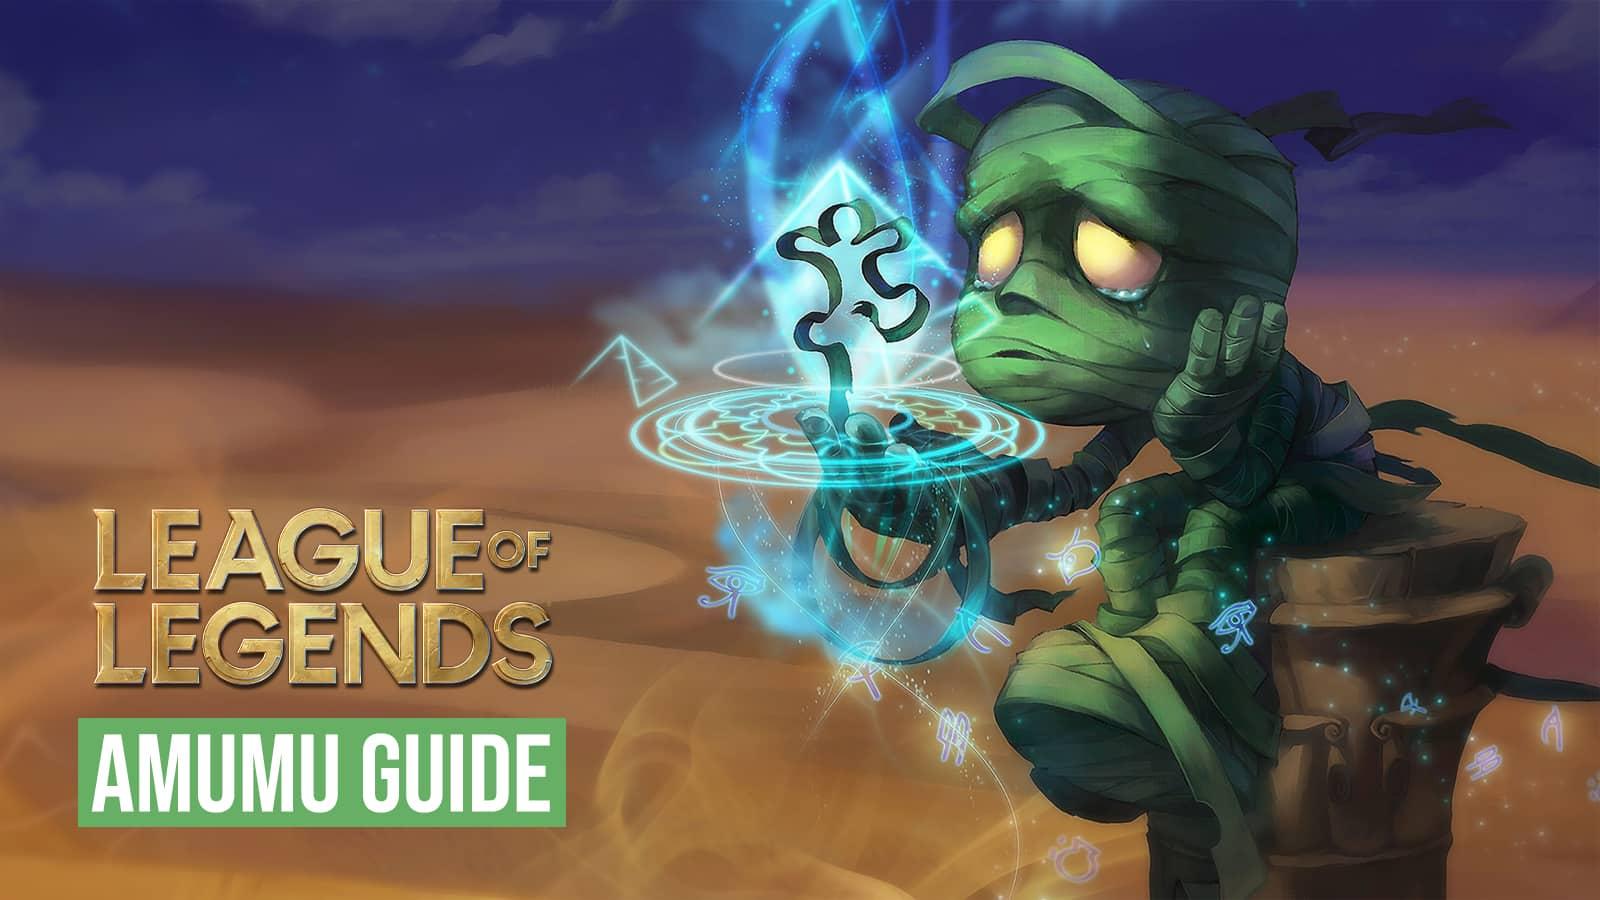 Amumu League of Legends guide best runes builds tips tricks skins